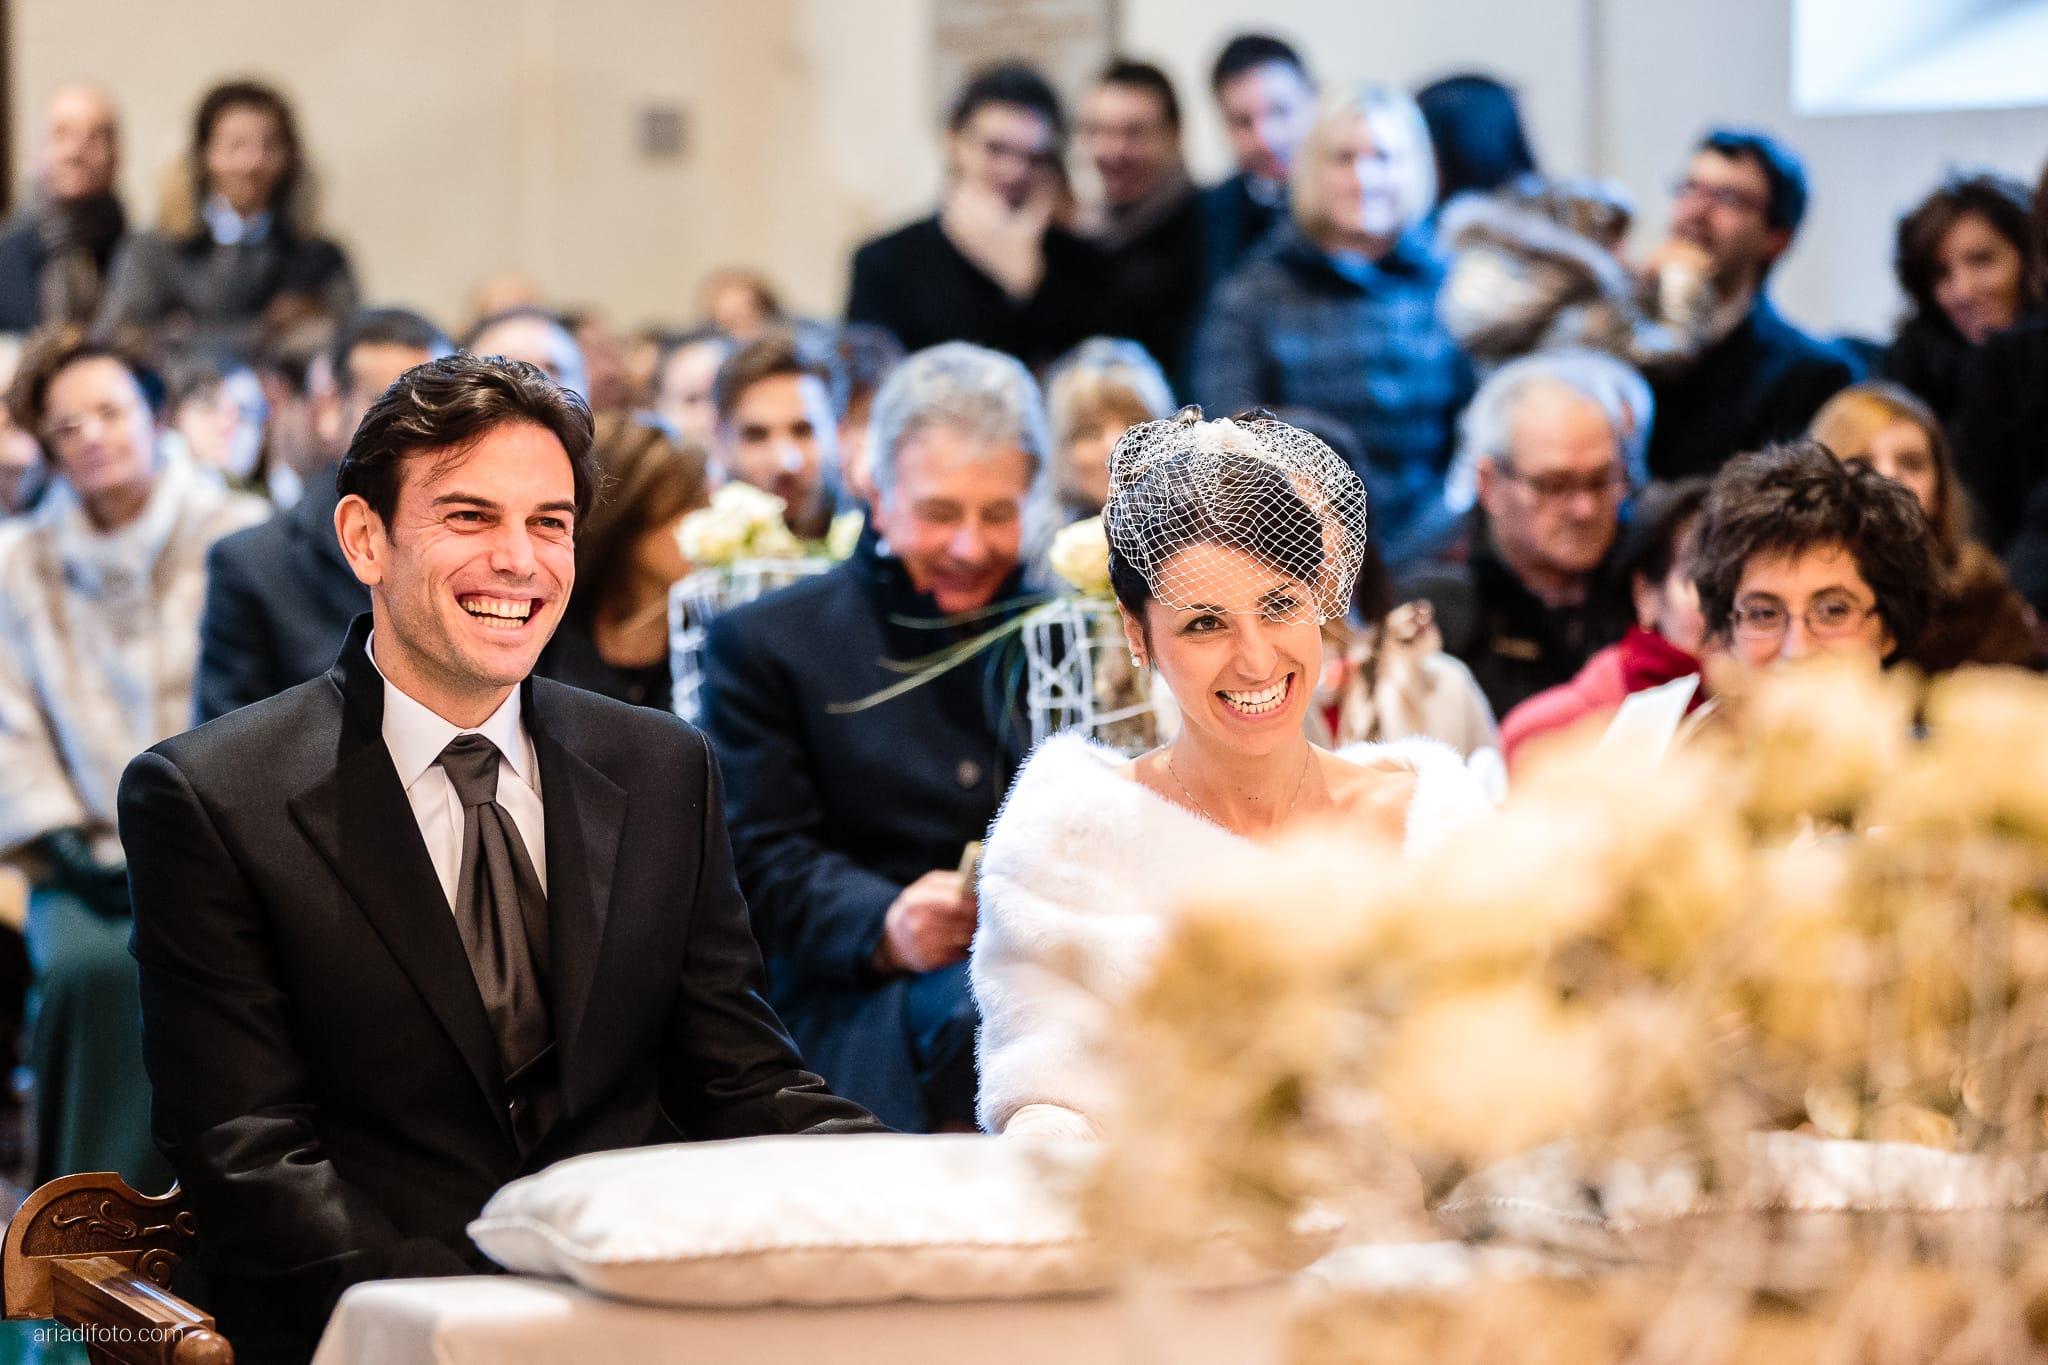 Elisa Matteo matrimonio Preval Gorizia Paradiso Pocenia Udine cerimonia Santa Maria dei Popoli